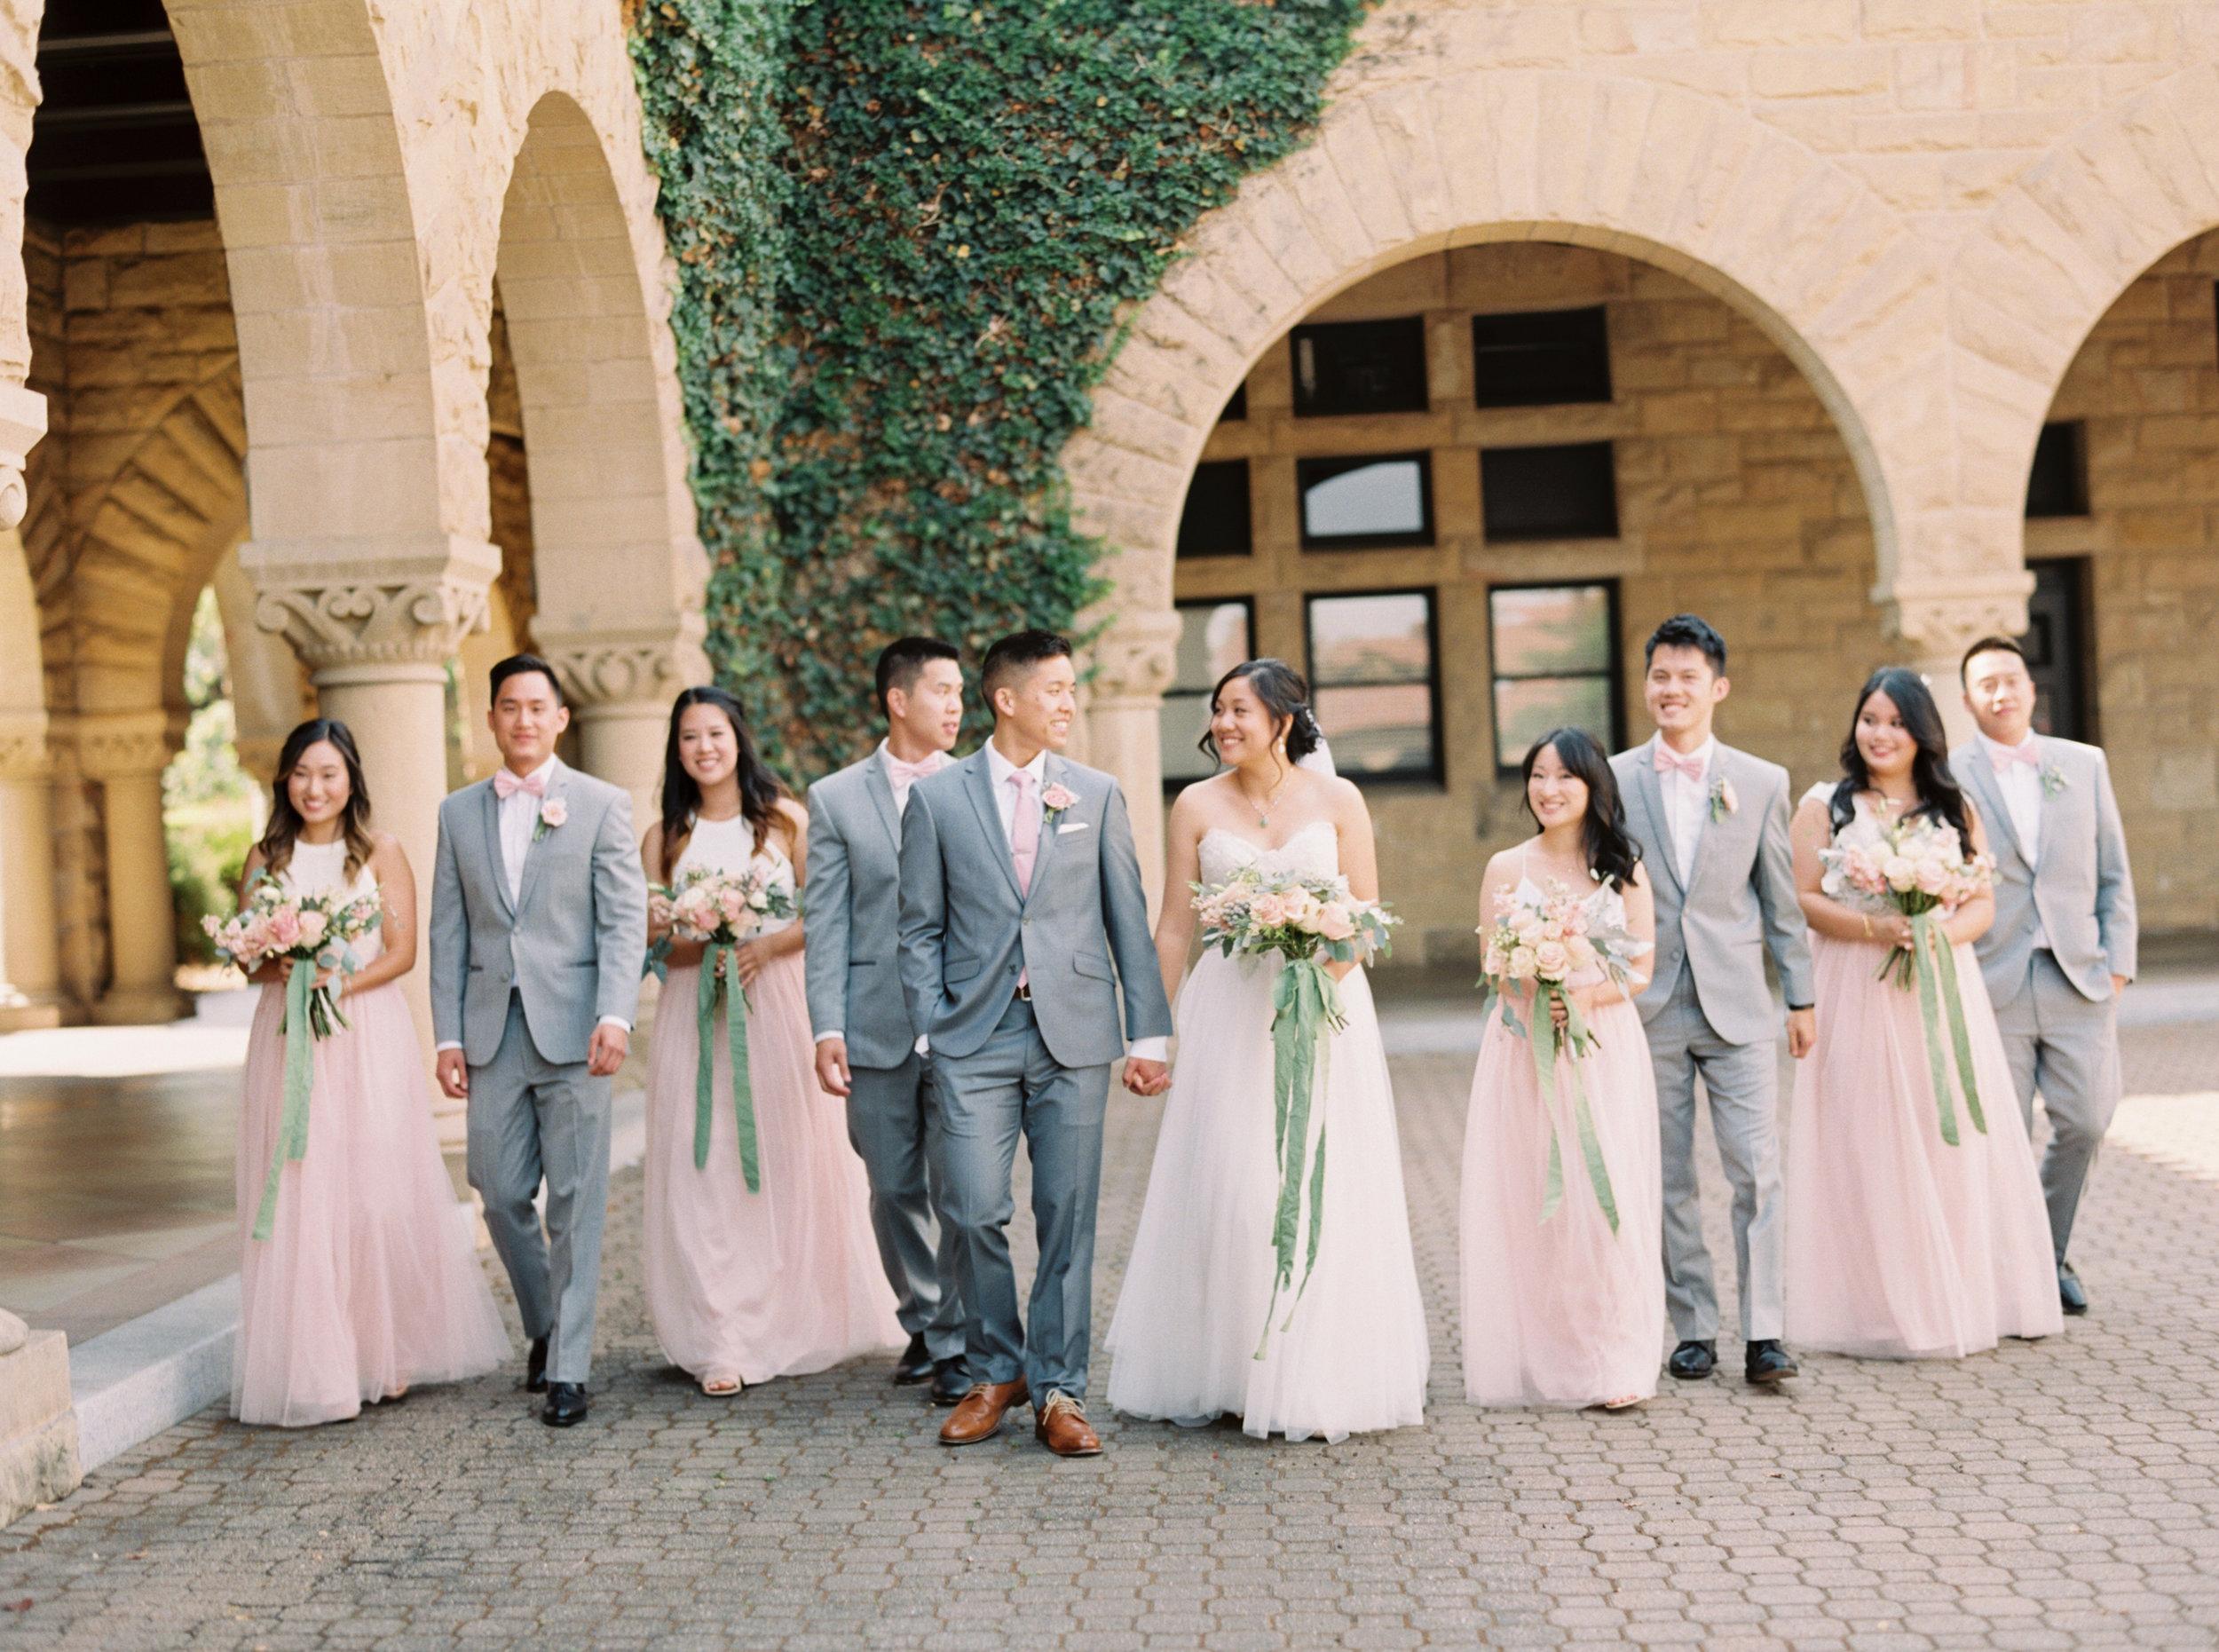 trynhphoto_wedding_photography_Standford_PaloAlto_SF_BayArea_Destination_OC_HA-14.jpg